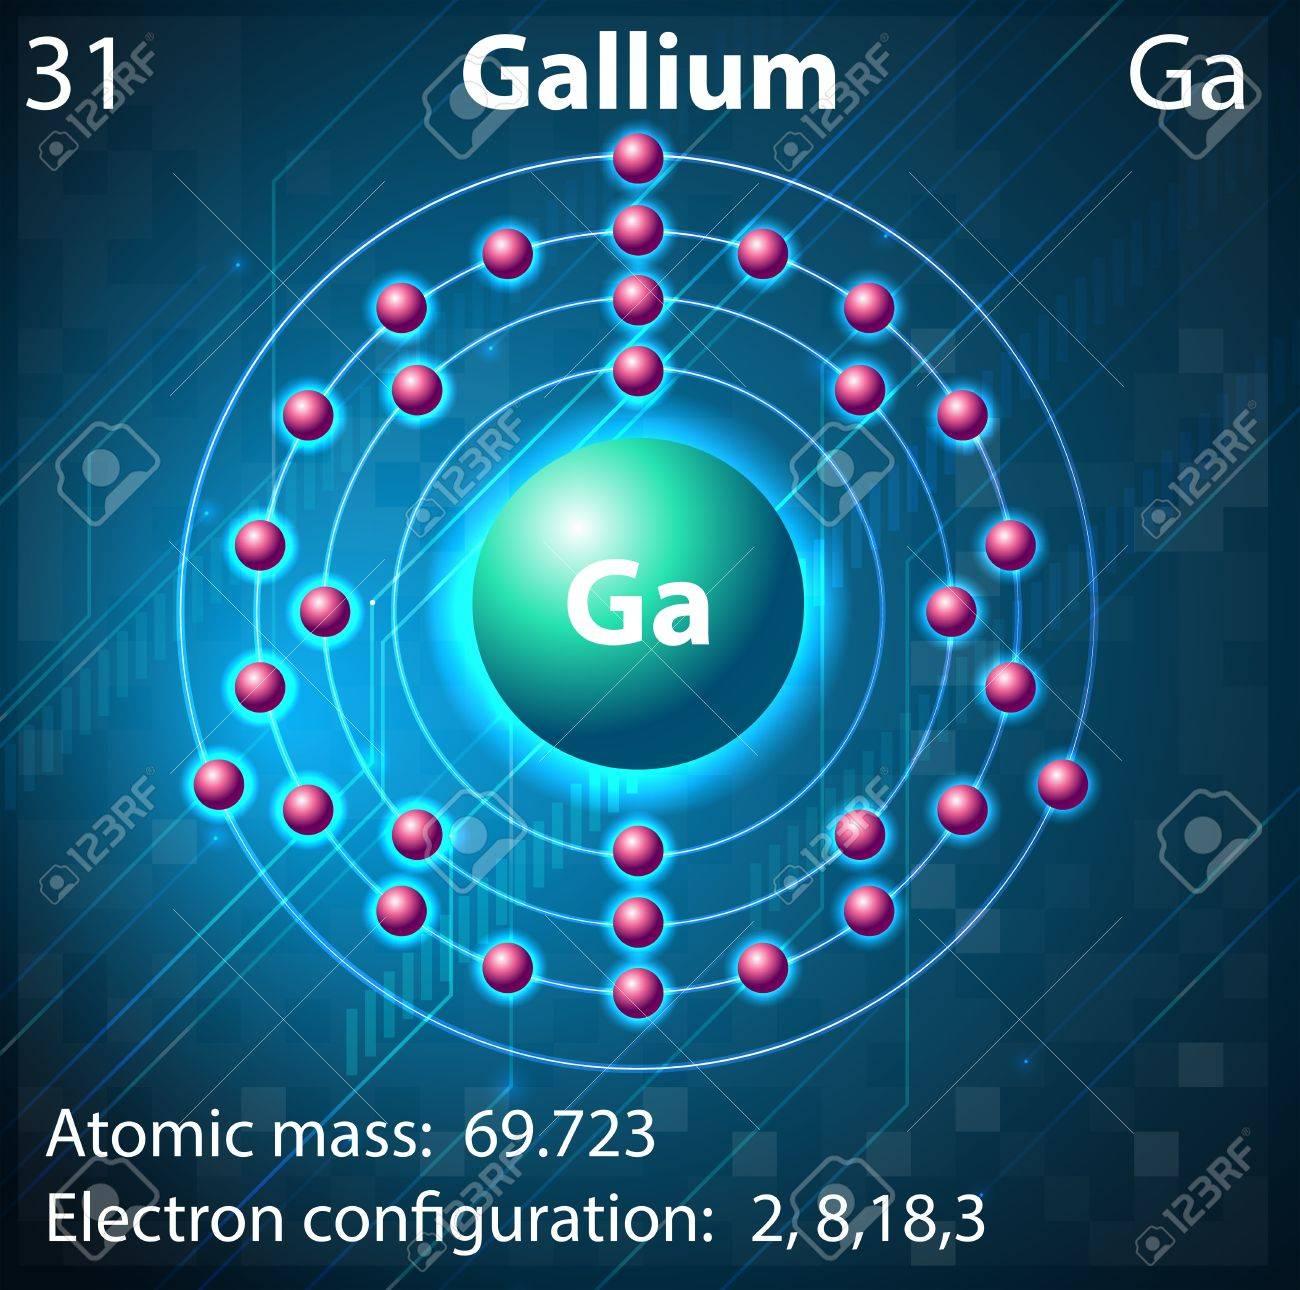 Illustration of the element Gallium Stock Vector - 21832772